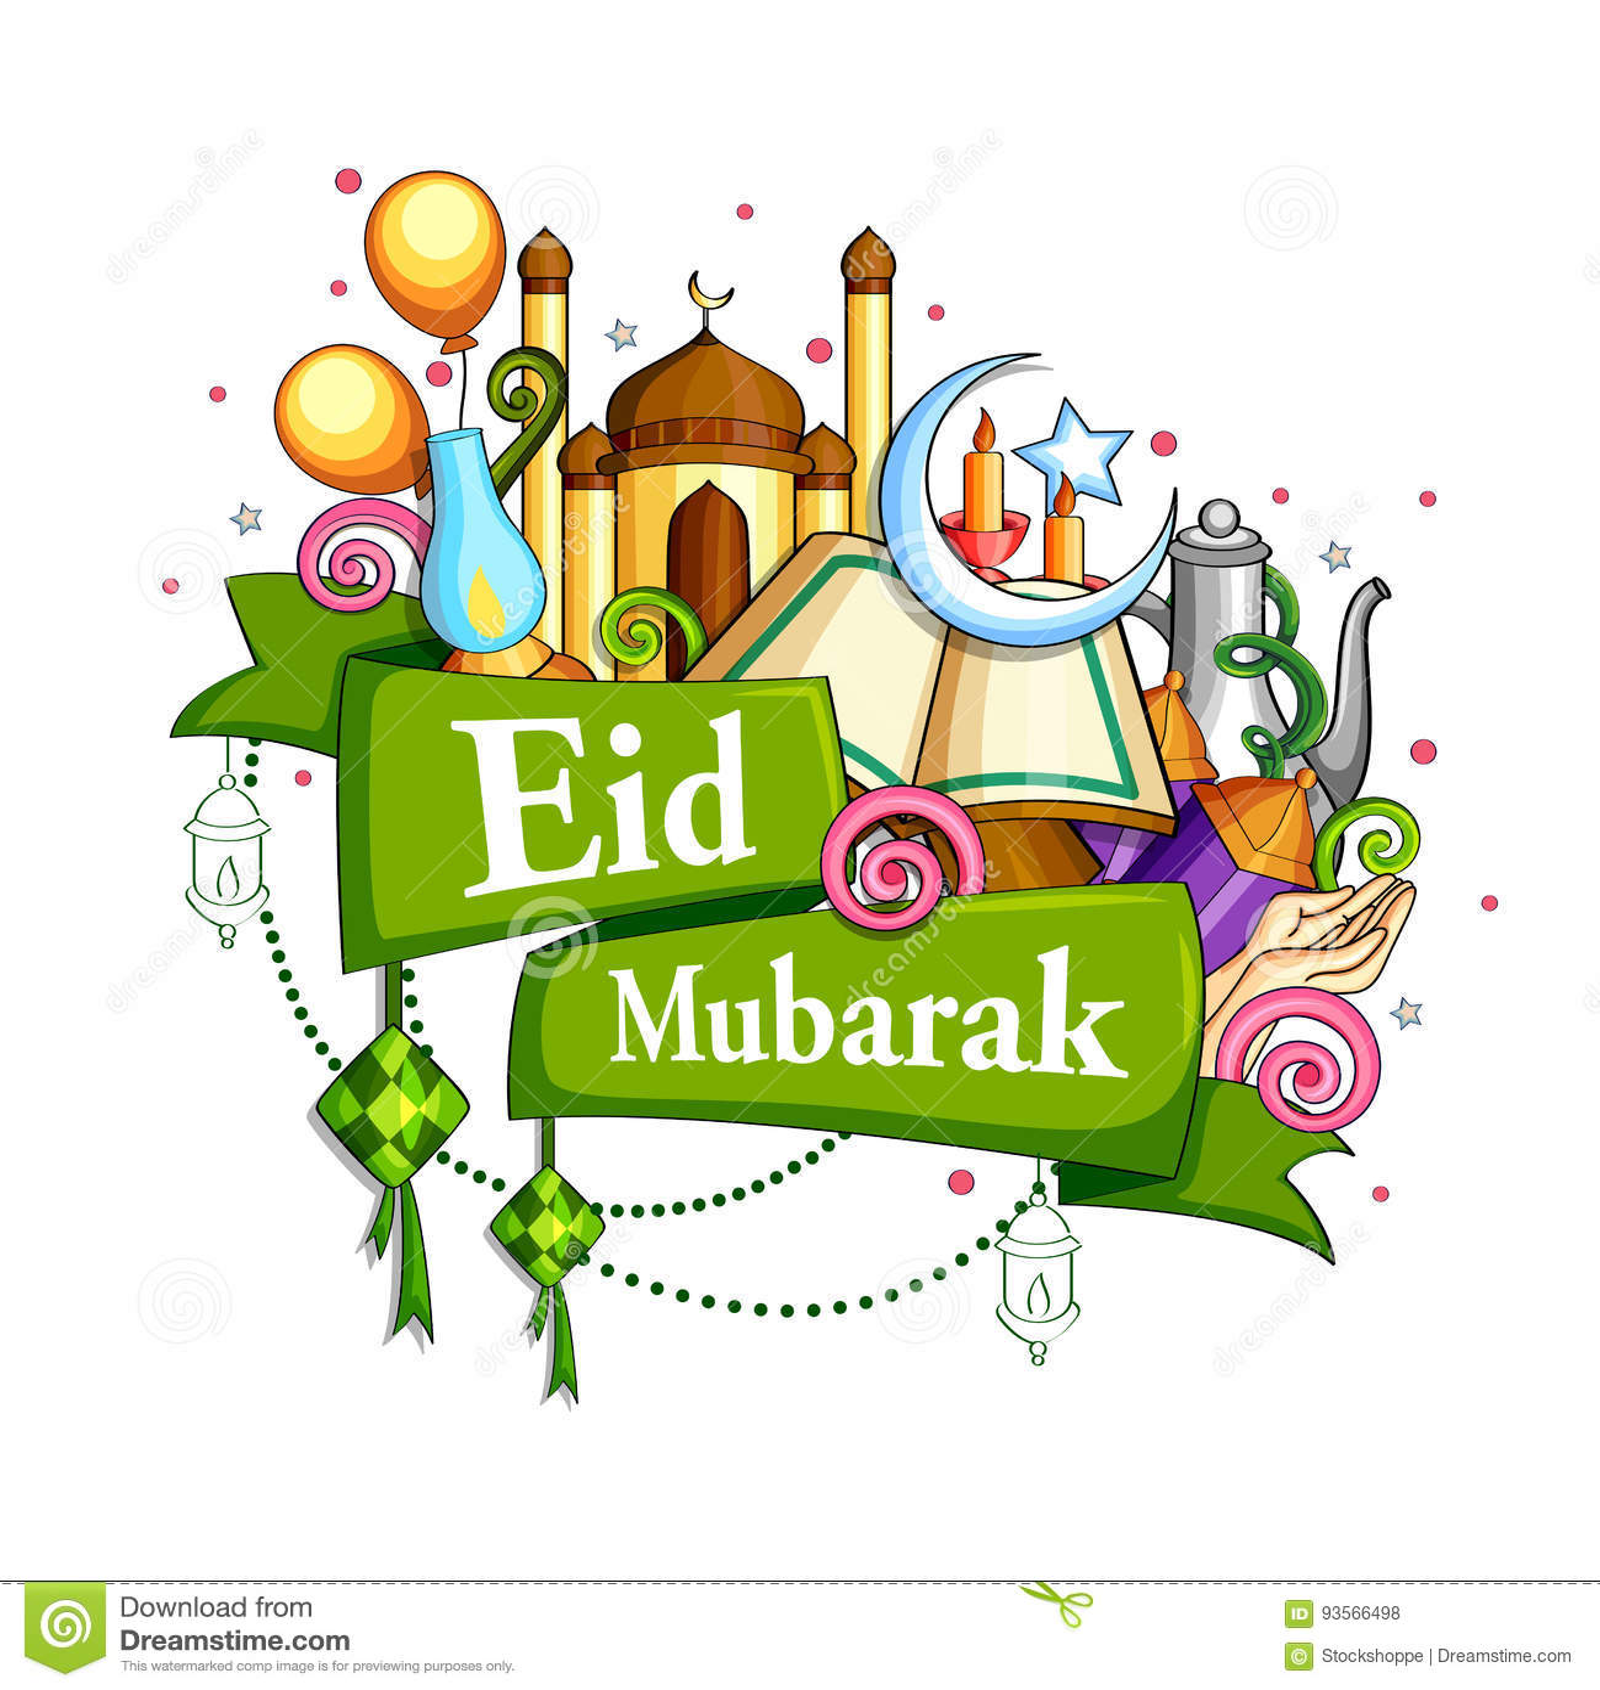 Eid Mubarak Blessing para el fondo de Eid